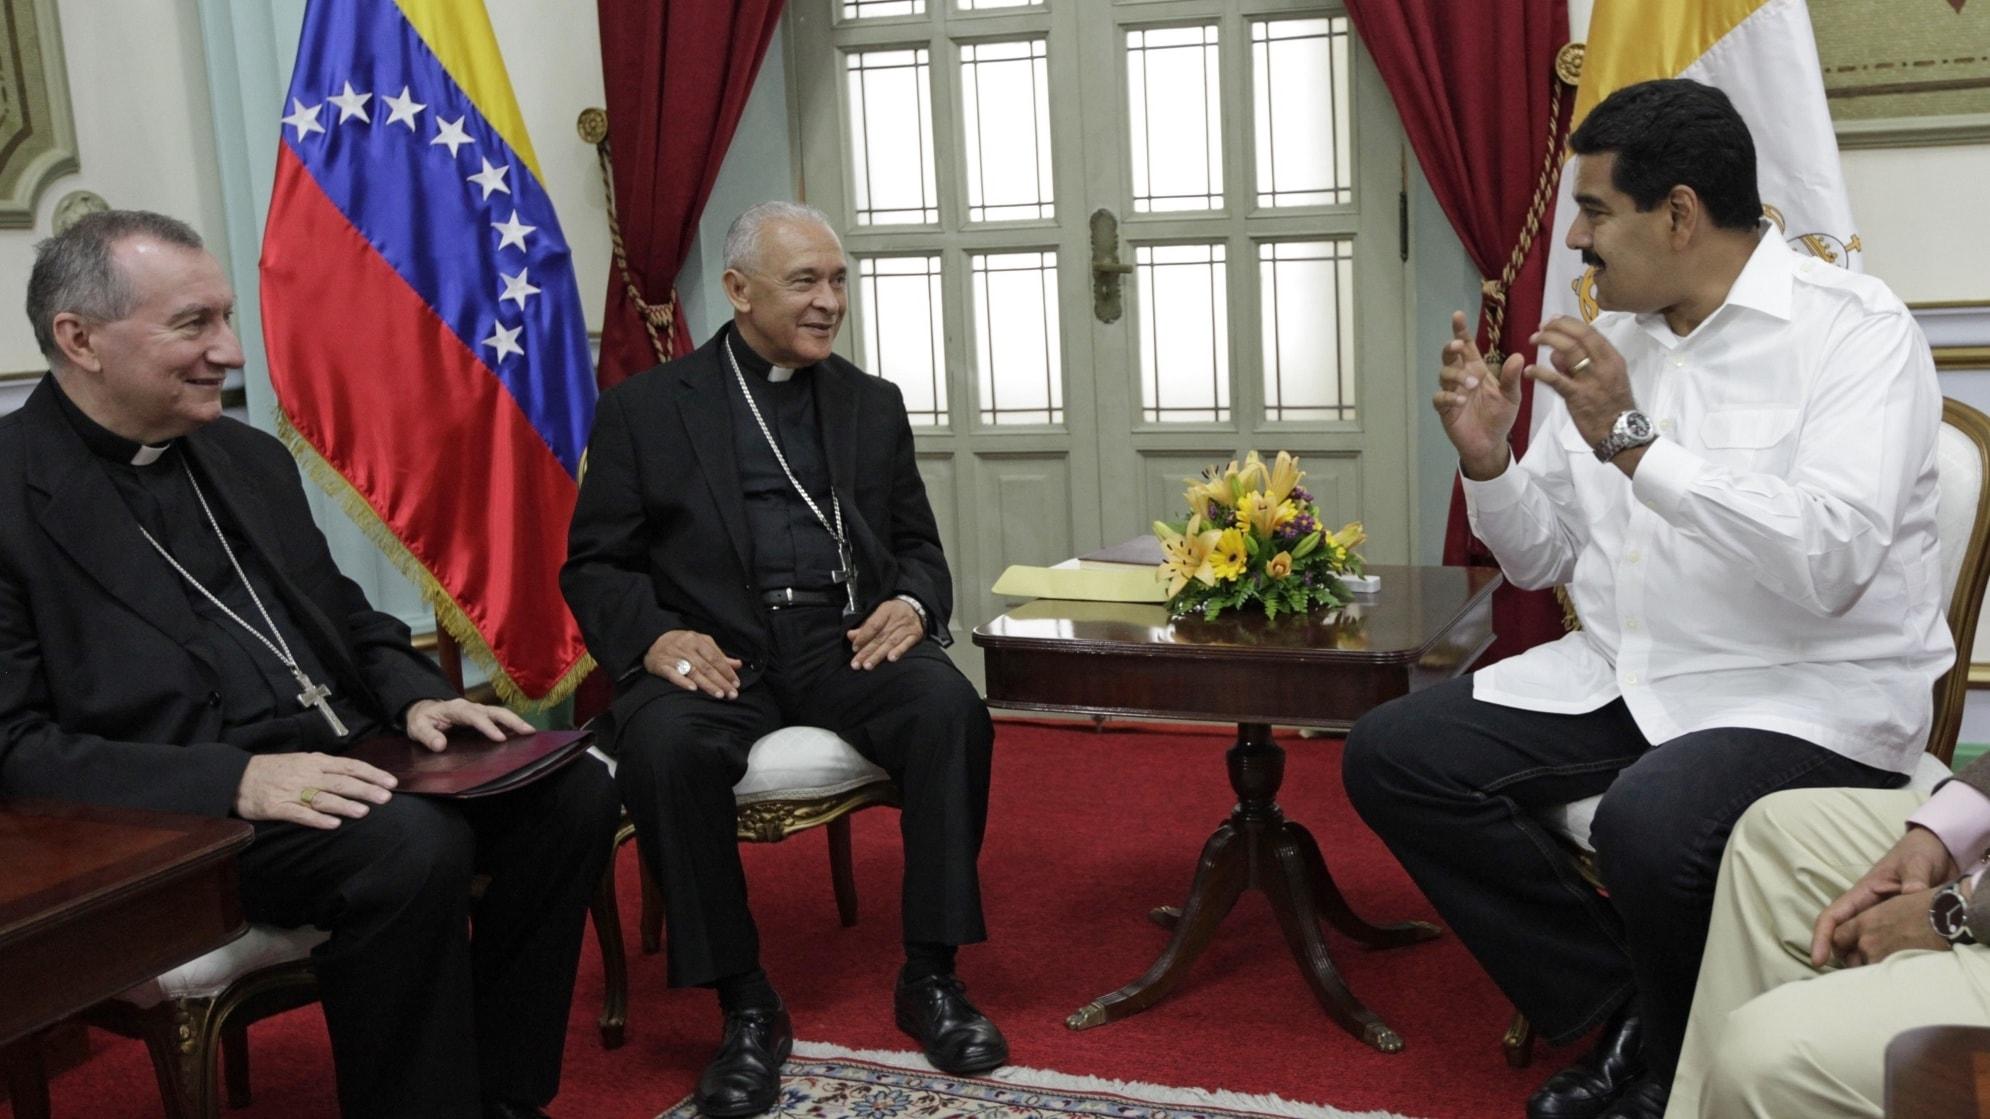 Katolska kyrkan kritiserar regimen i Venezuela